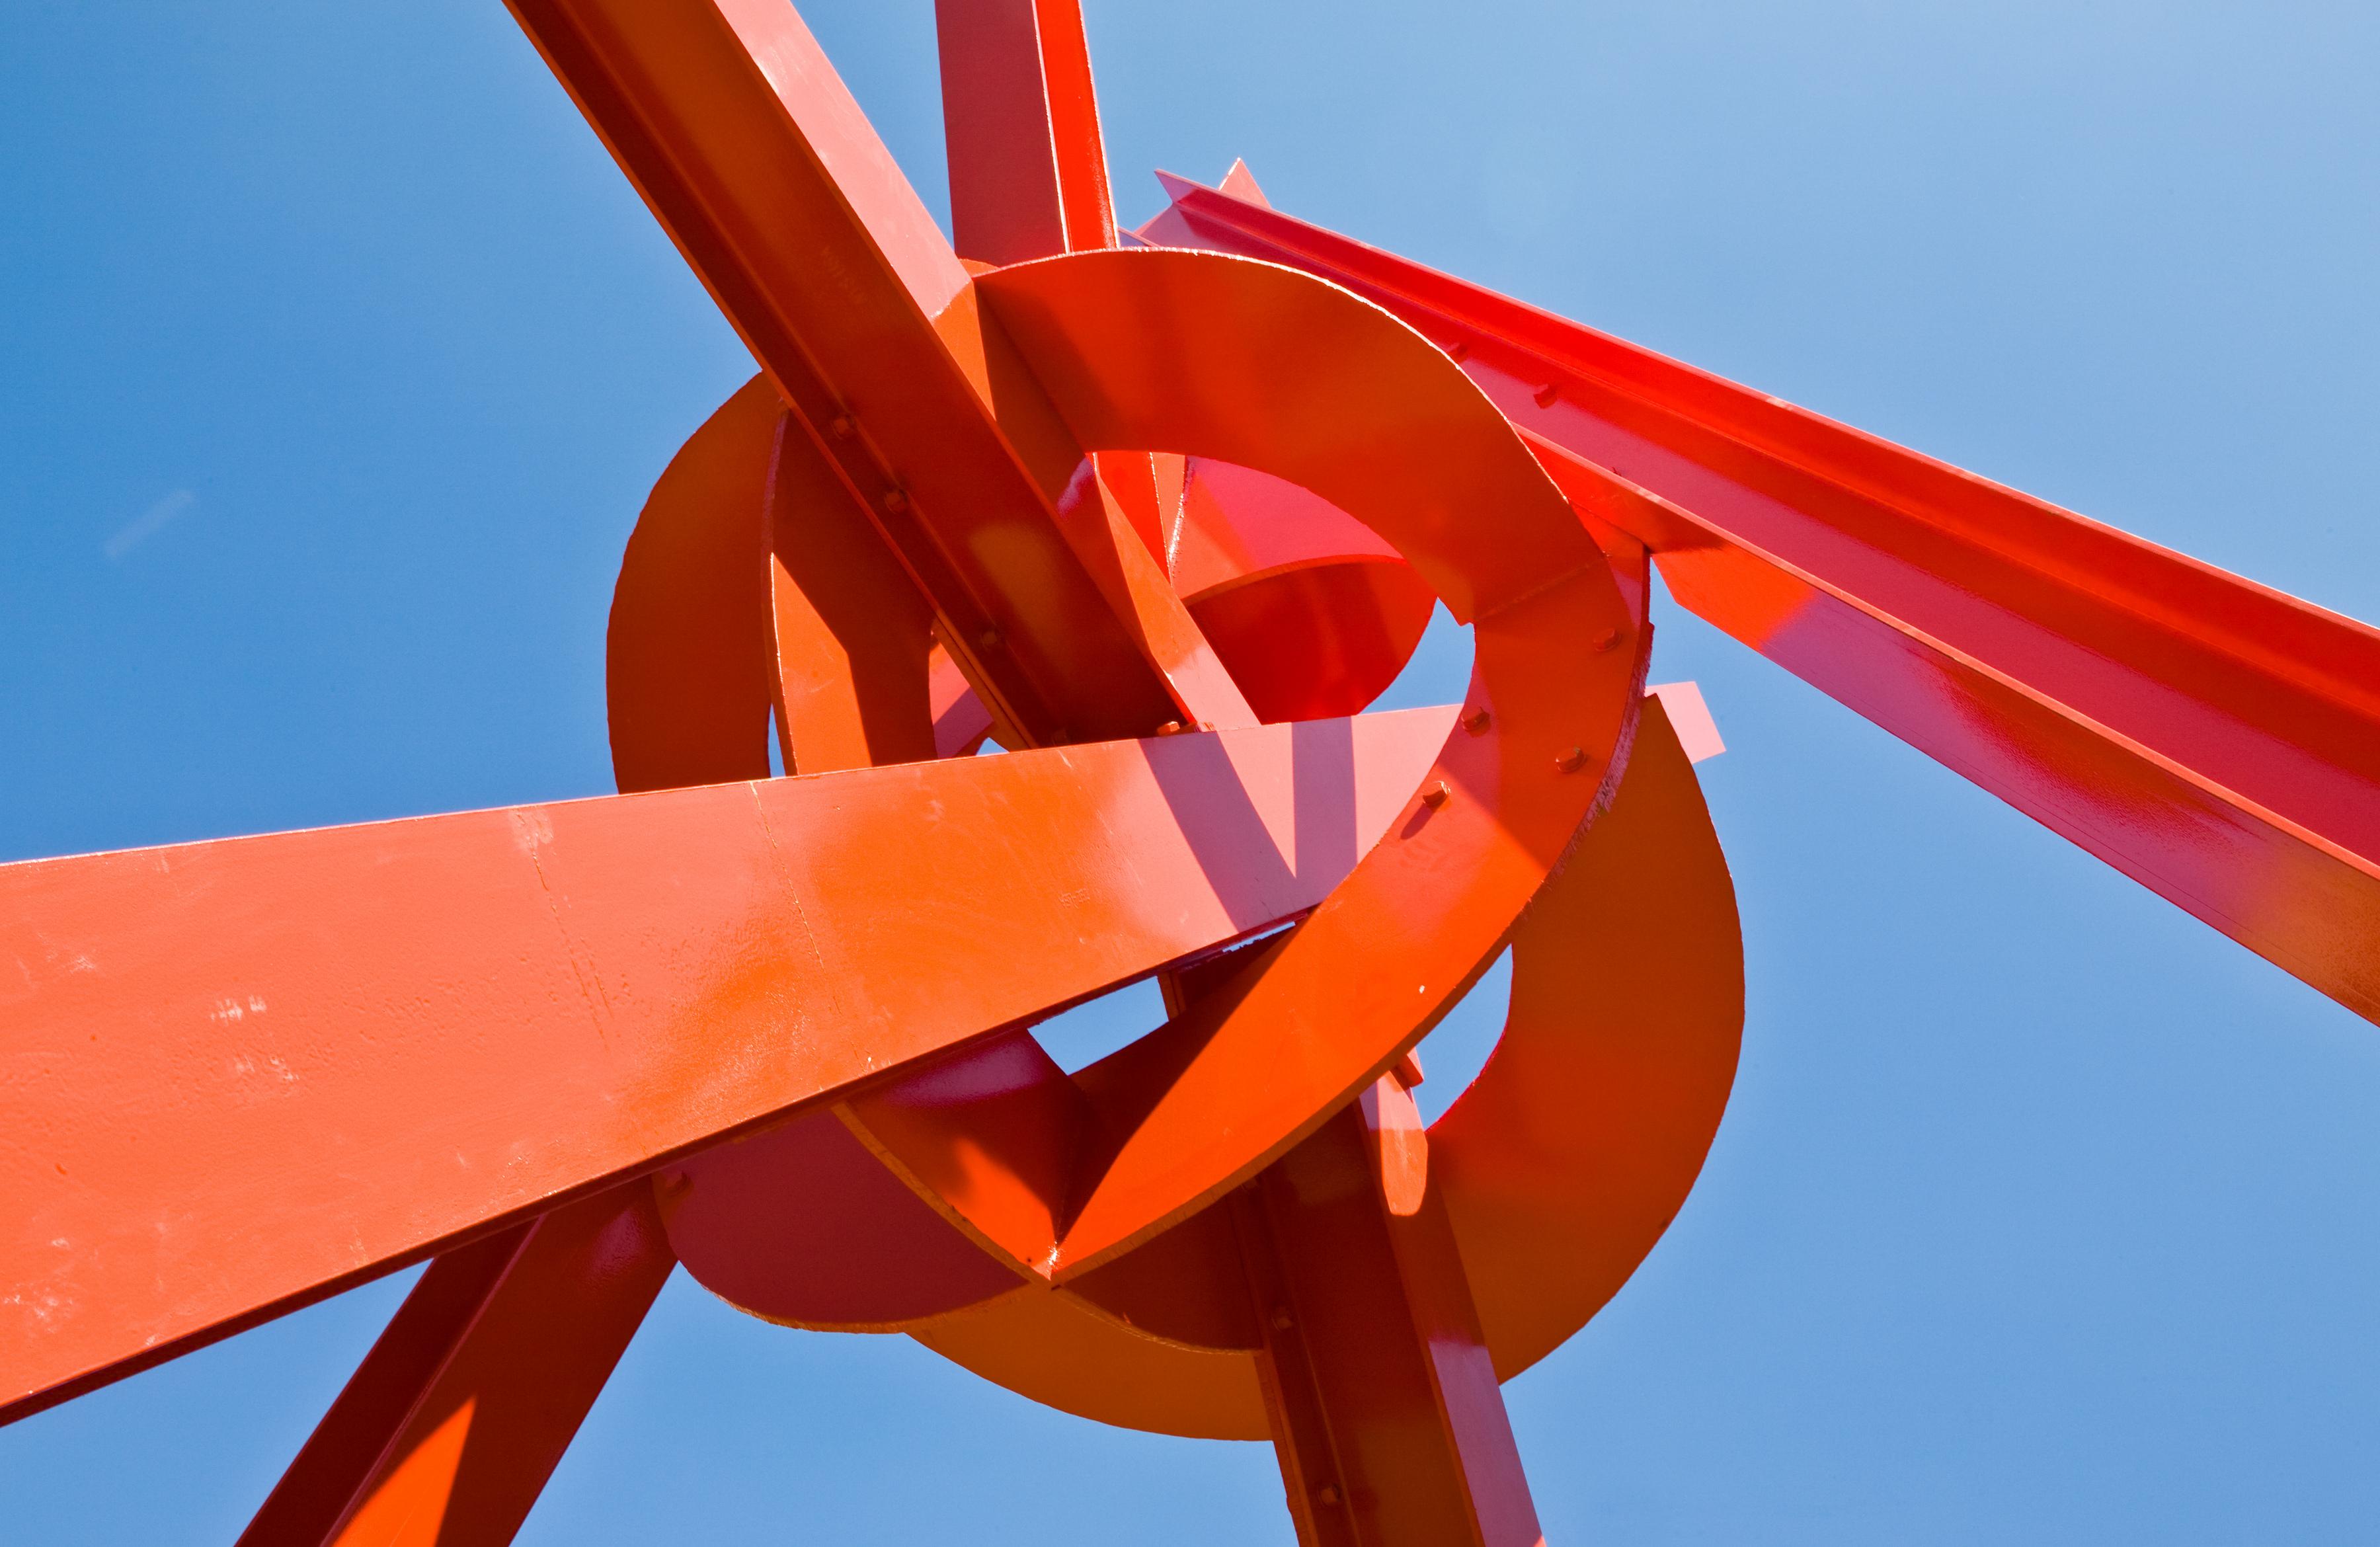 University of Texas Landmarks - Represents disuvero clockknot opening photobybenaqua 000503838